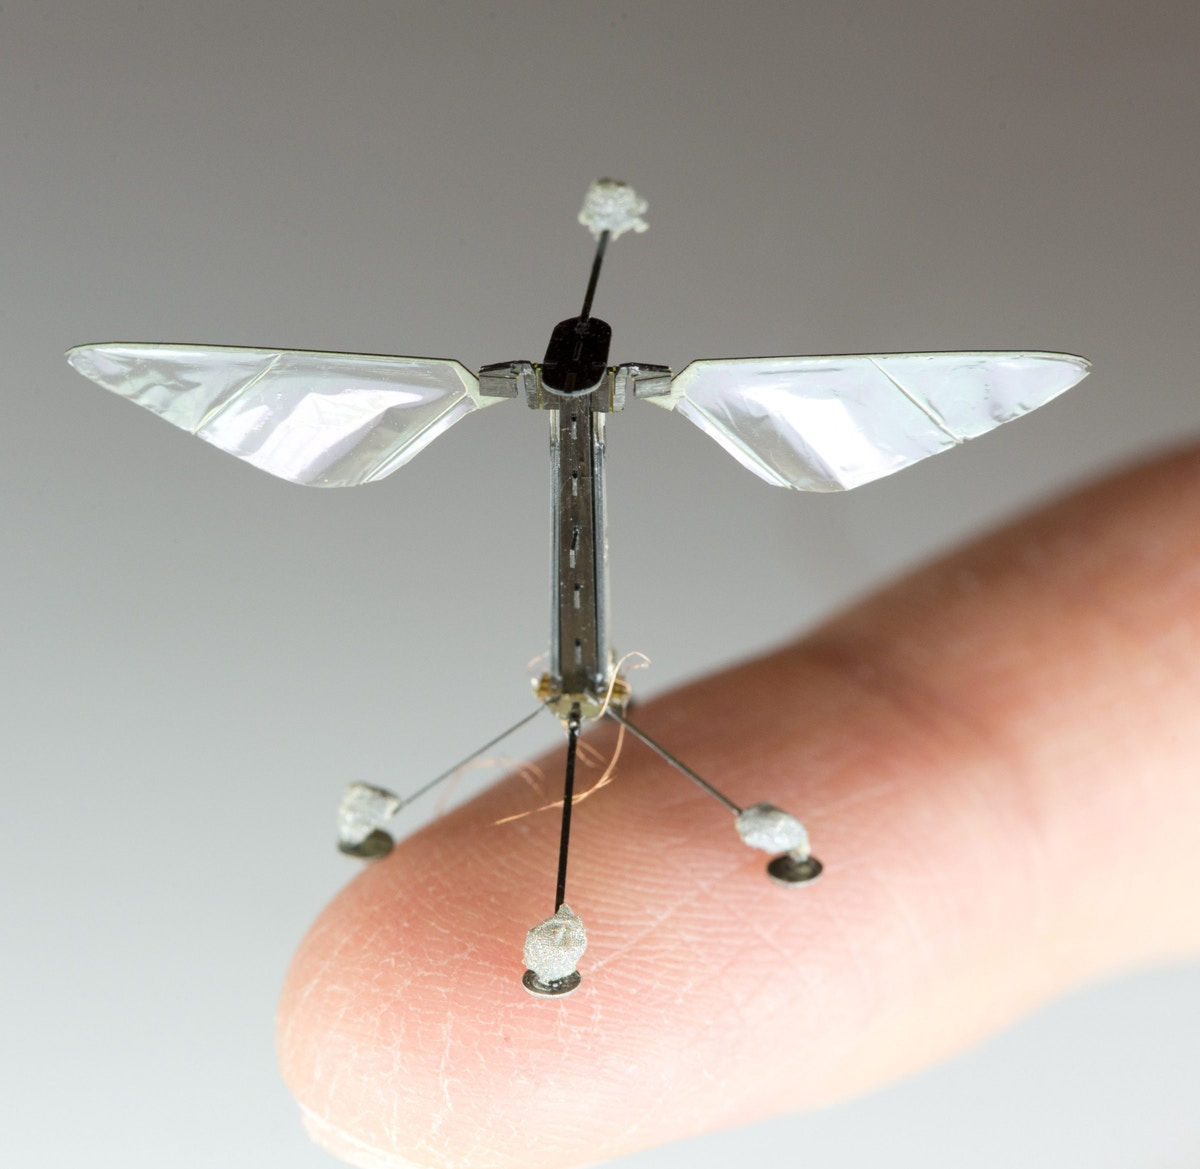 Robobee - Lightest Drone